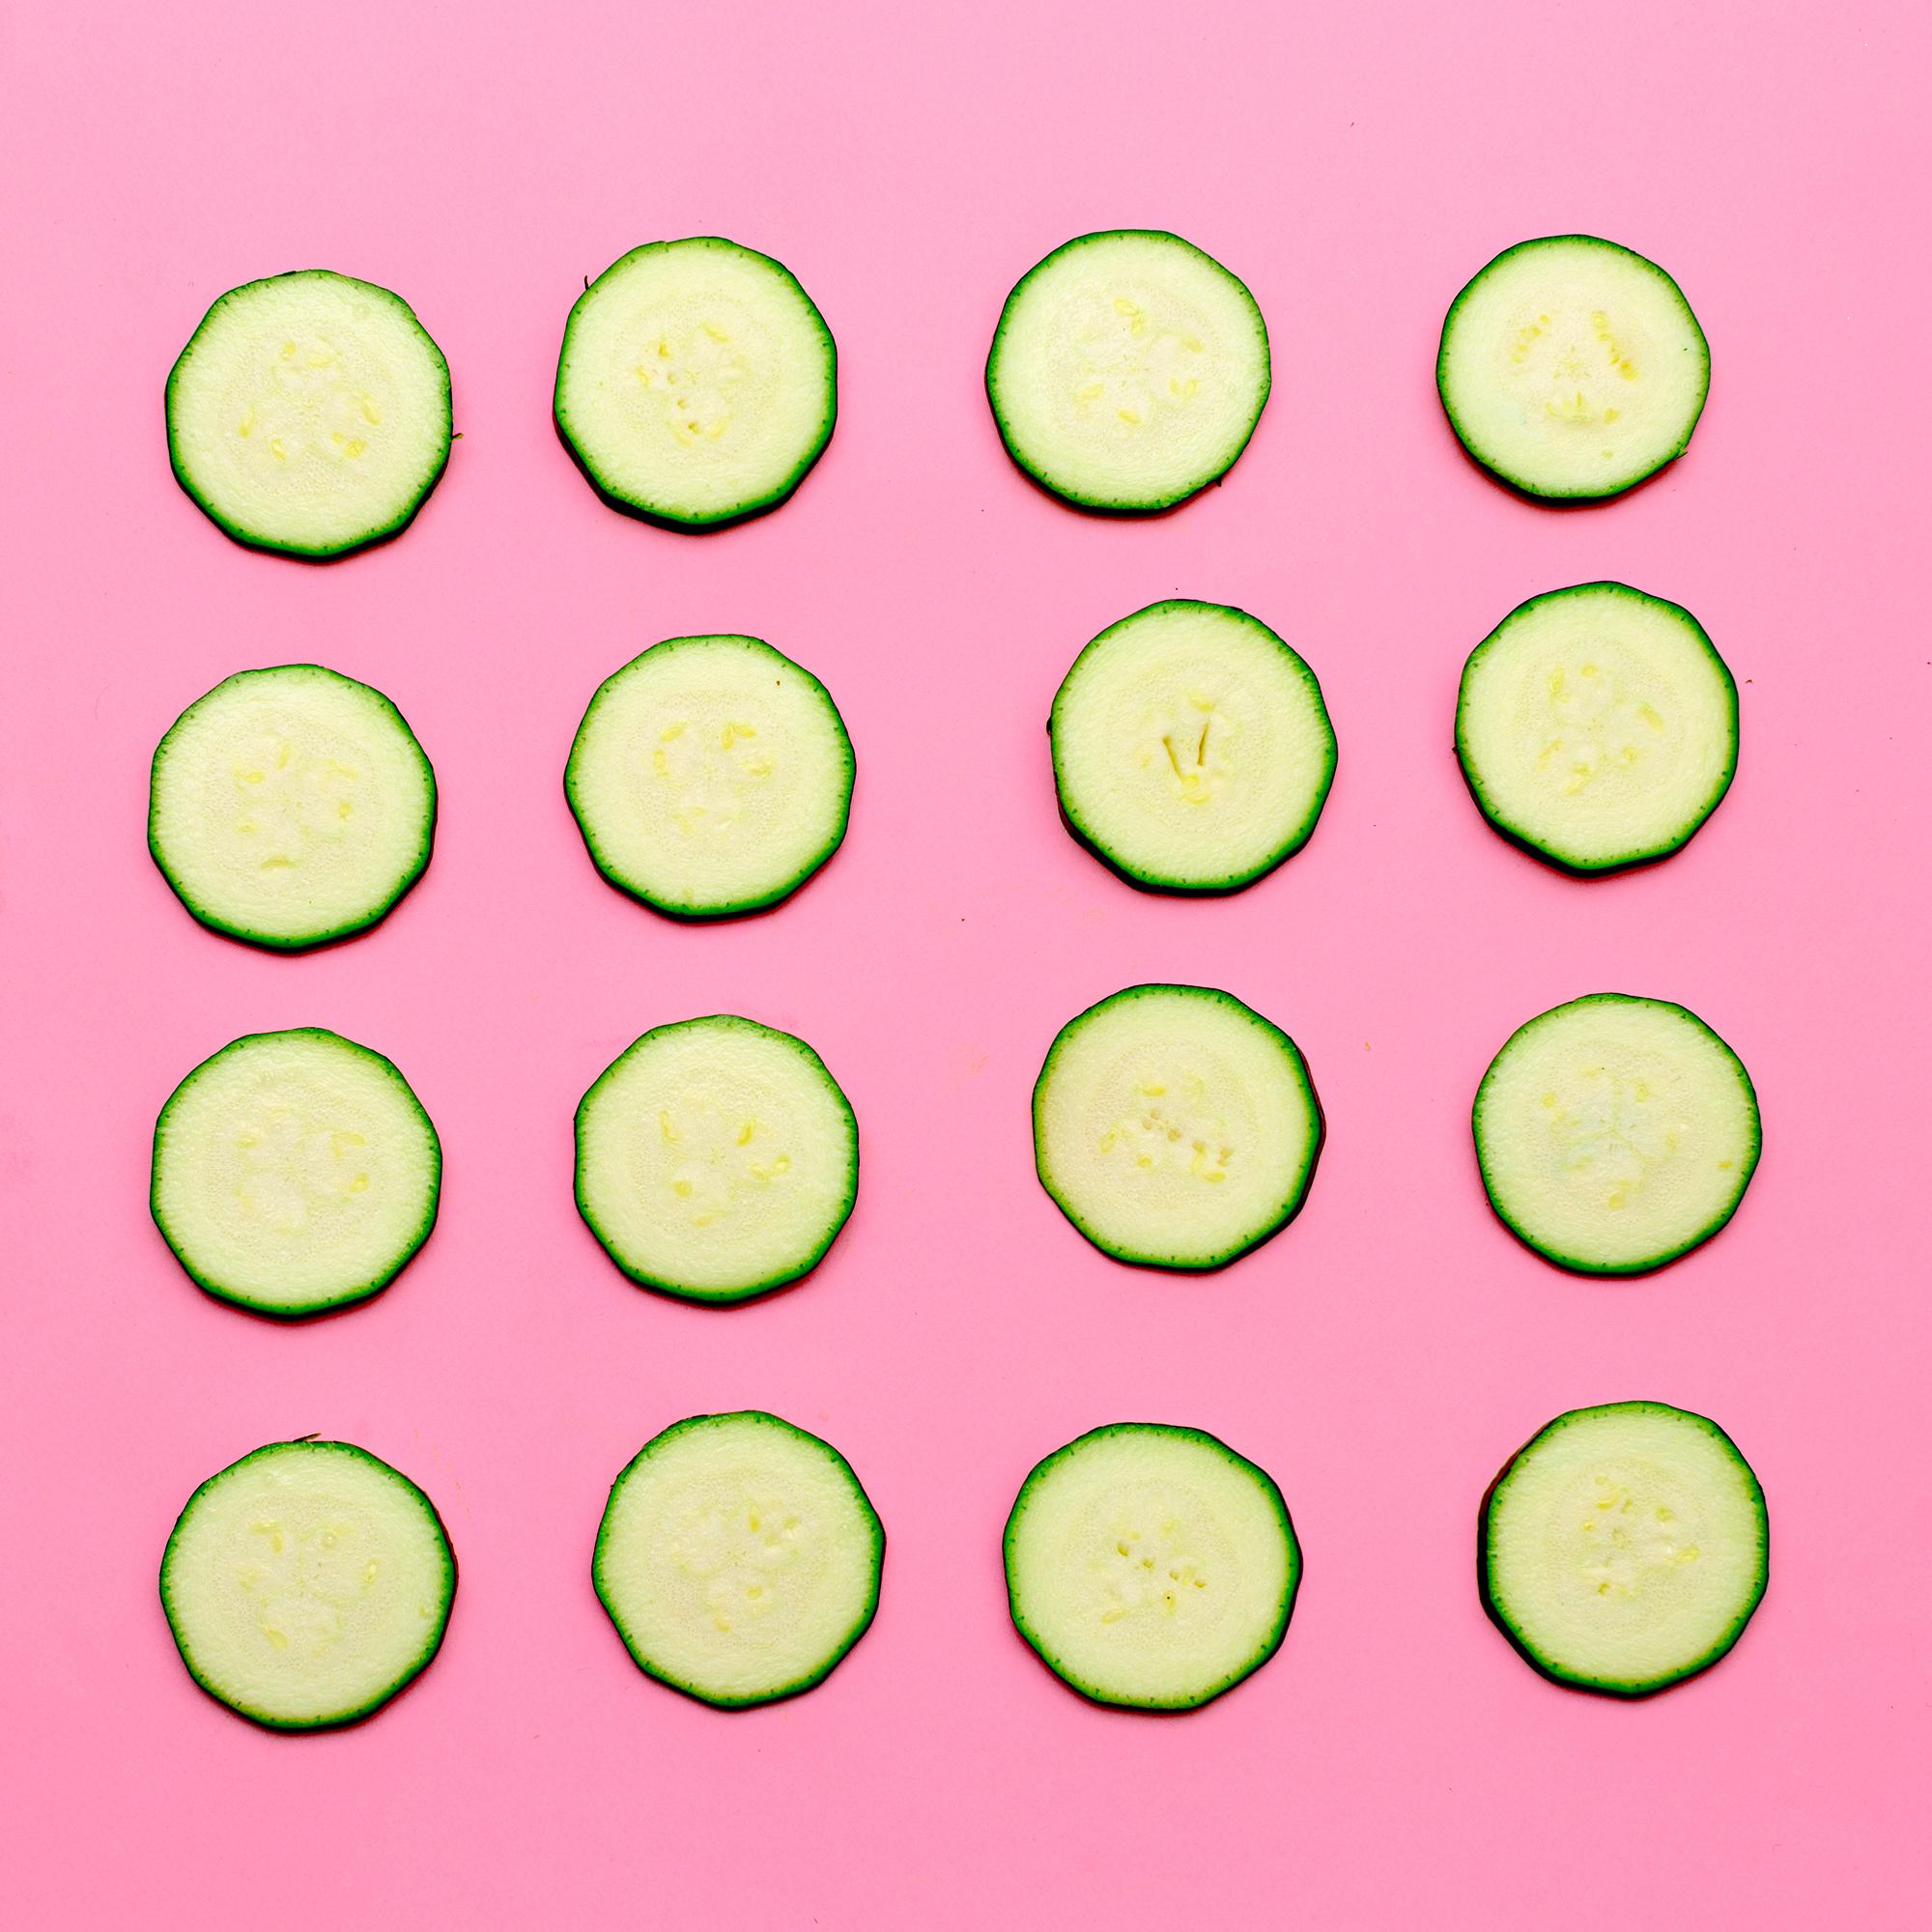 zucchini-background-vegan-minimal-art-design-PYYJJAG.jpg